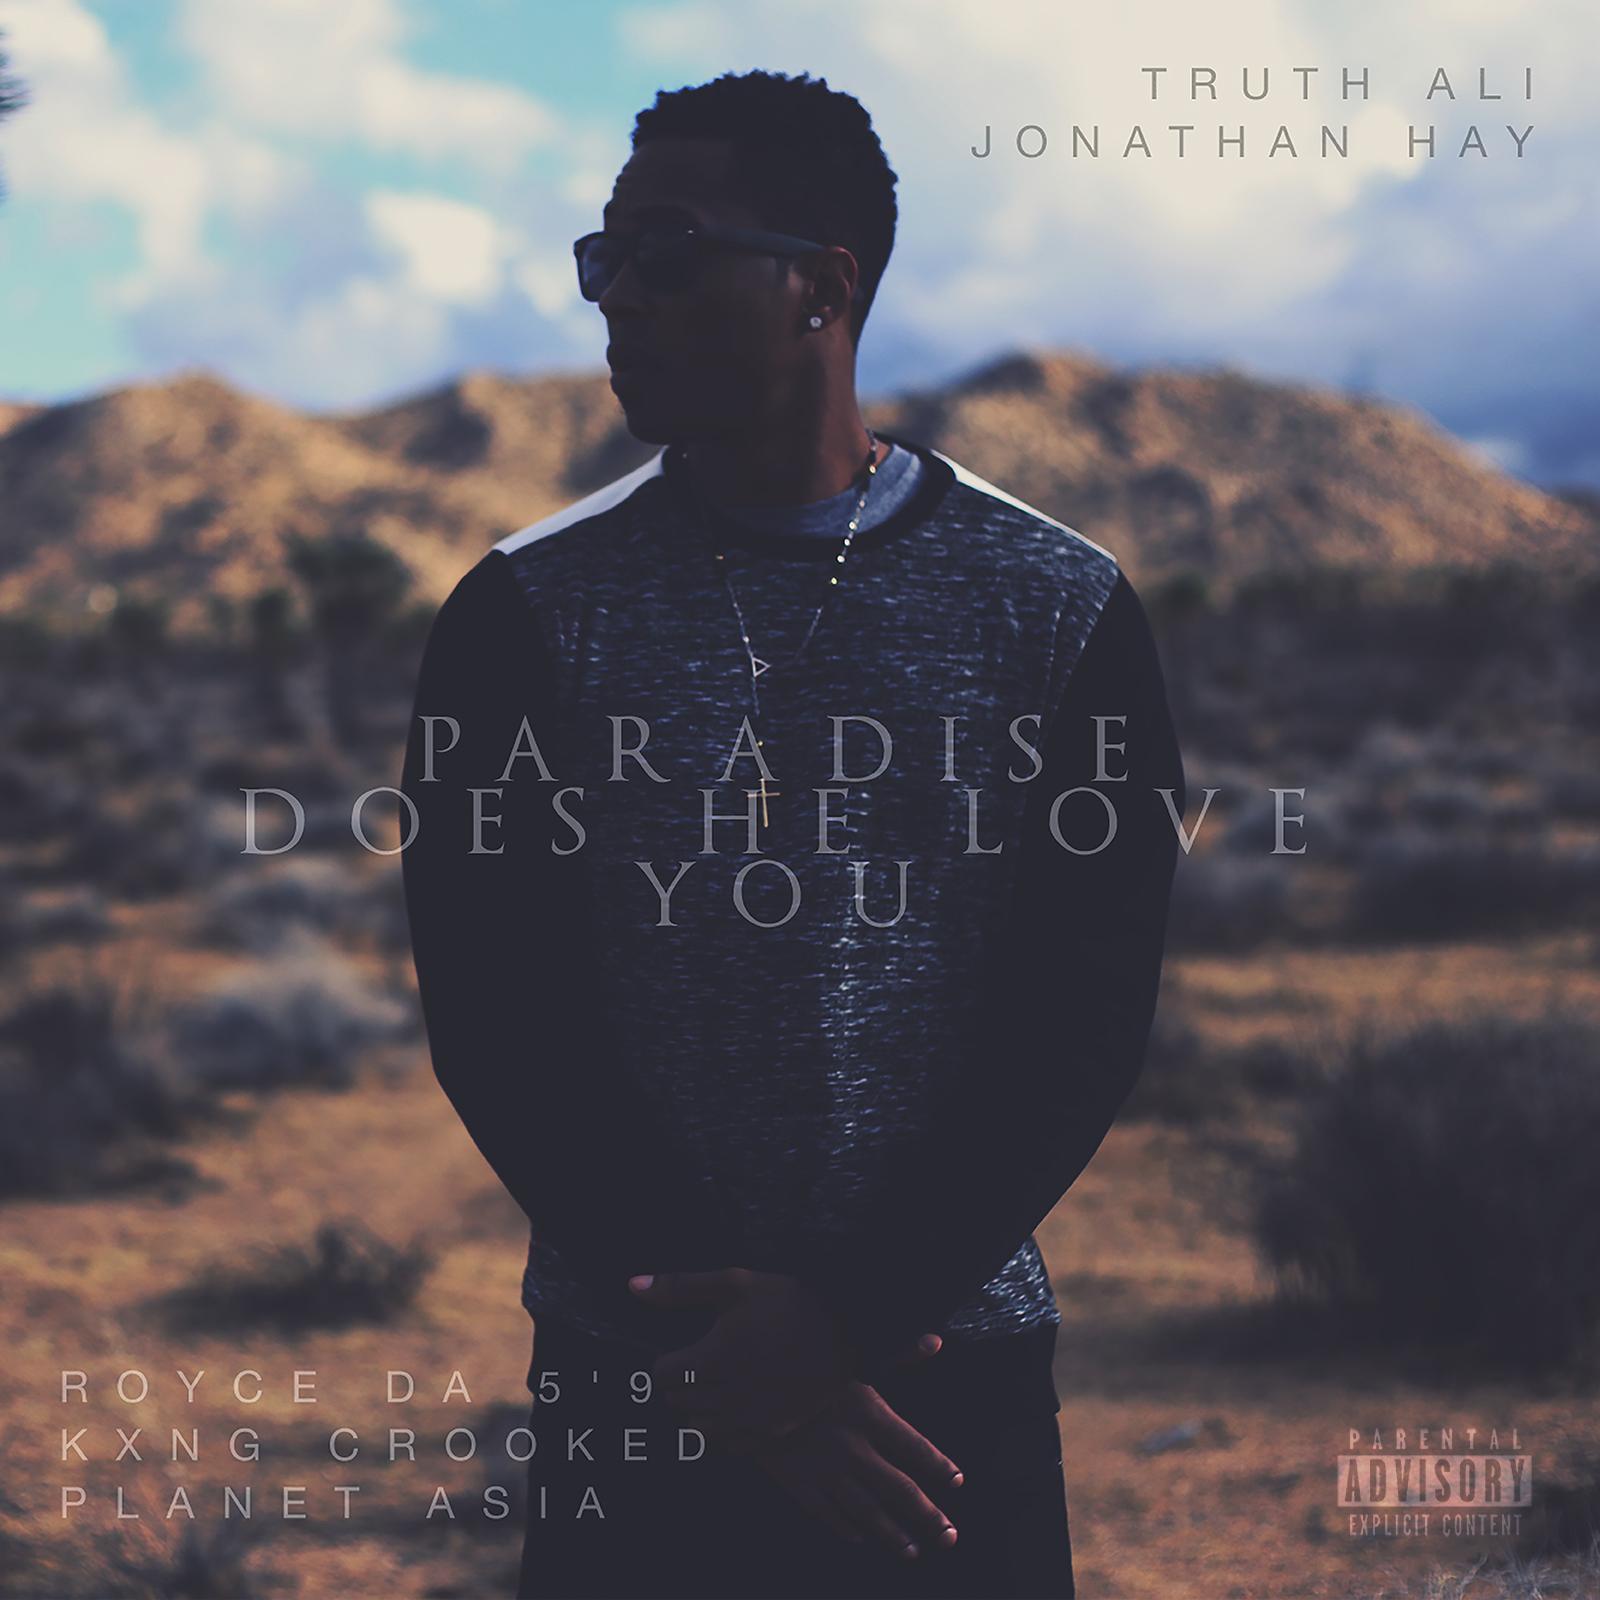 Paradise (Does He Love You) [feat. Royce da 5'9